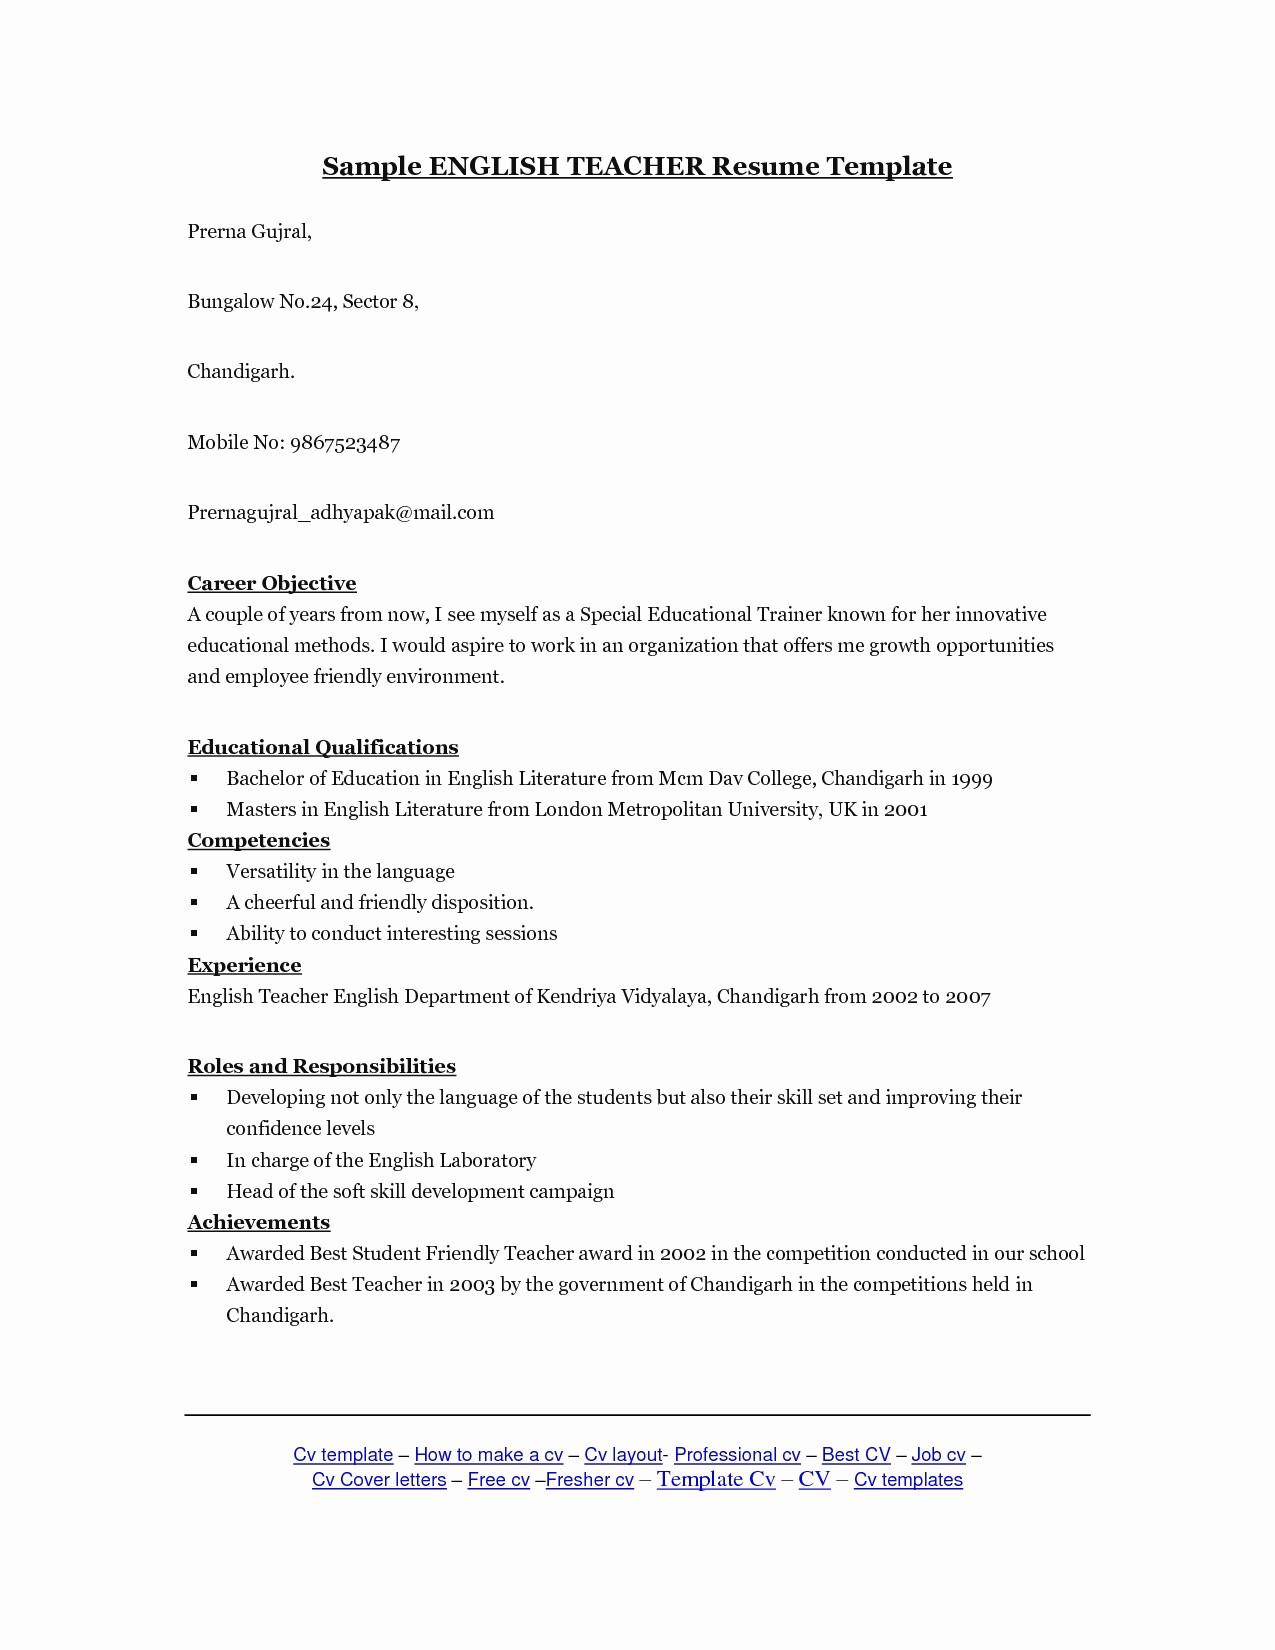 Free Resume Templates In English Elegant English Resume Template